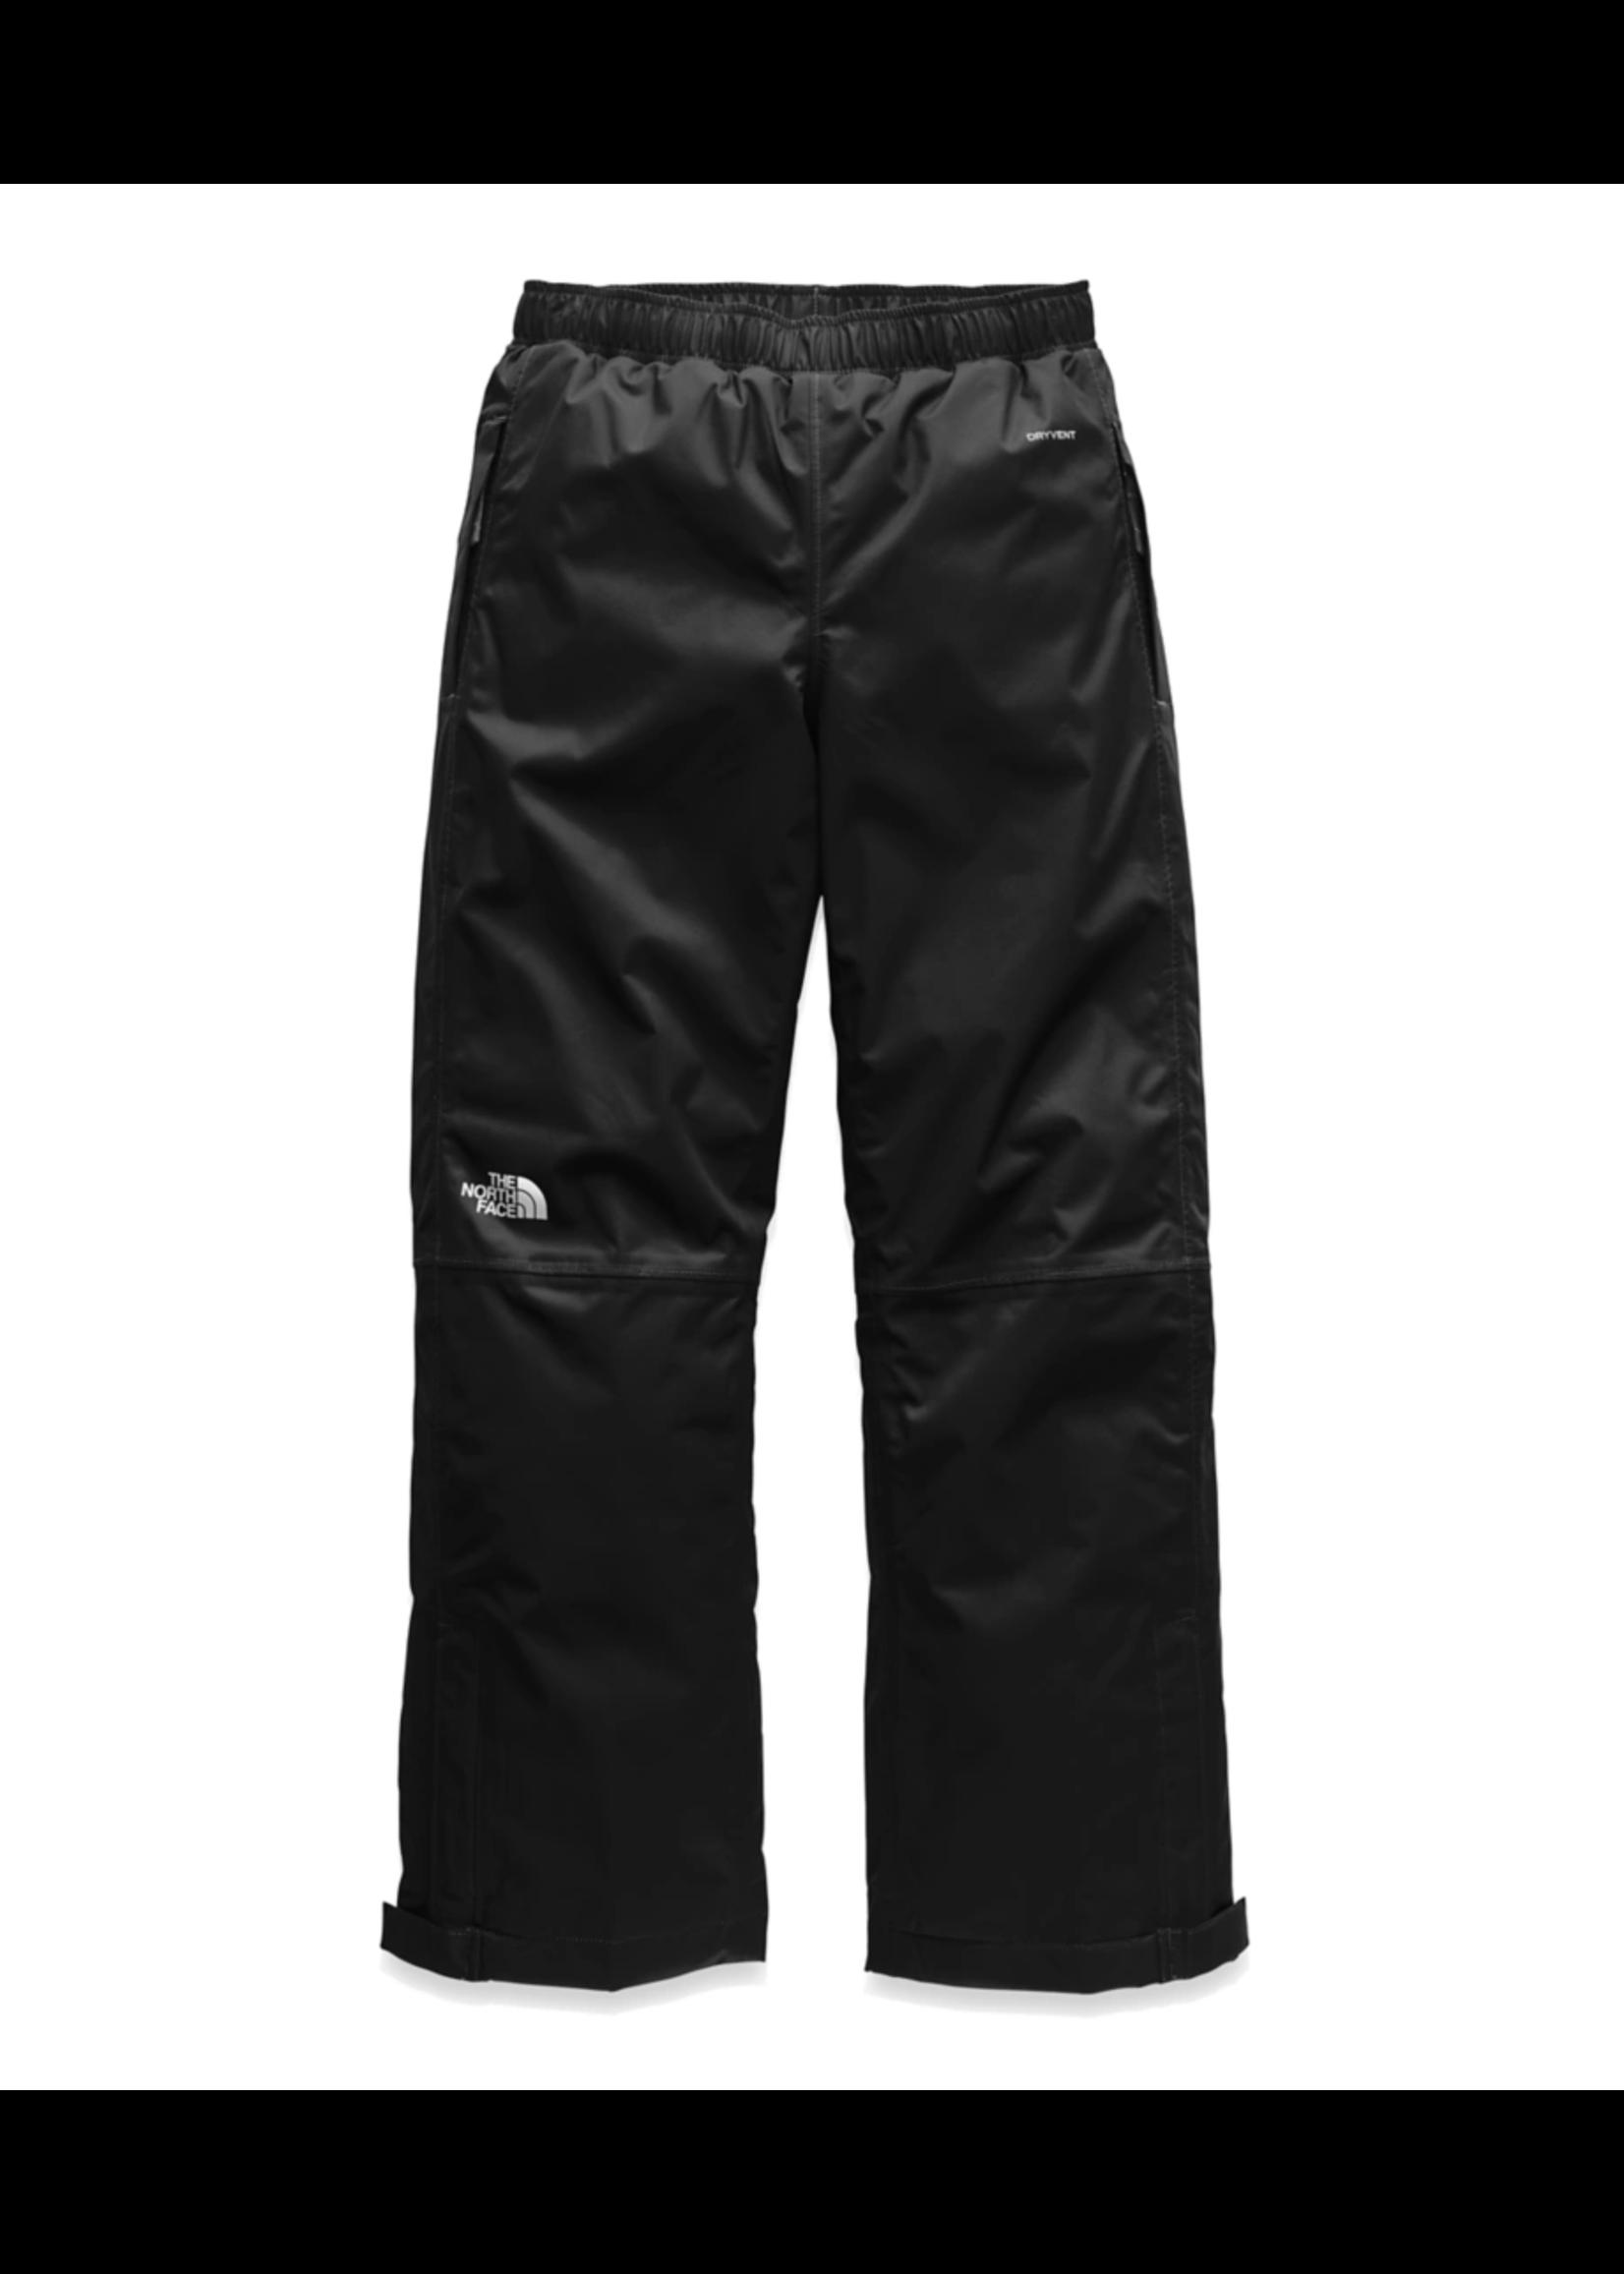 THE NORTH FACE Pantalon isolé Resolve / Small / Noir